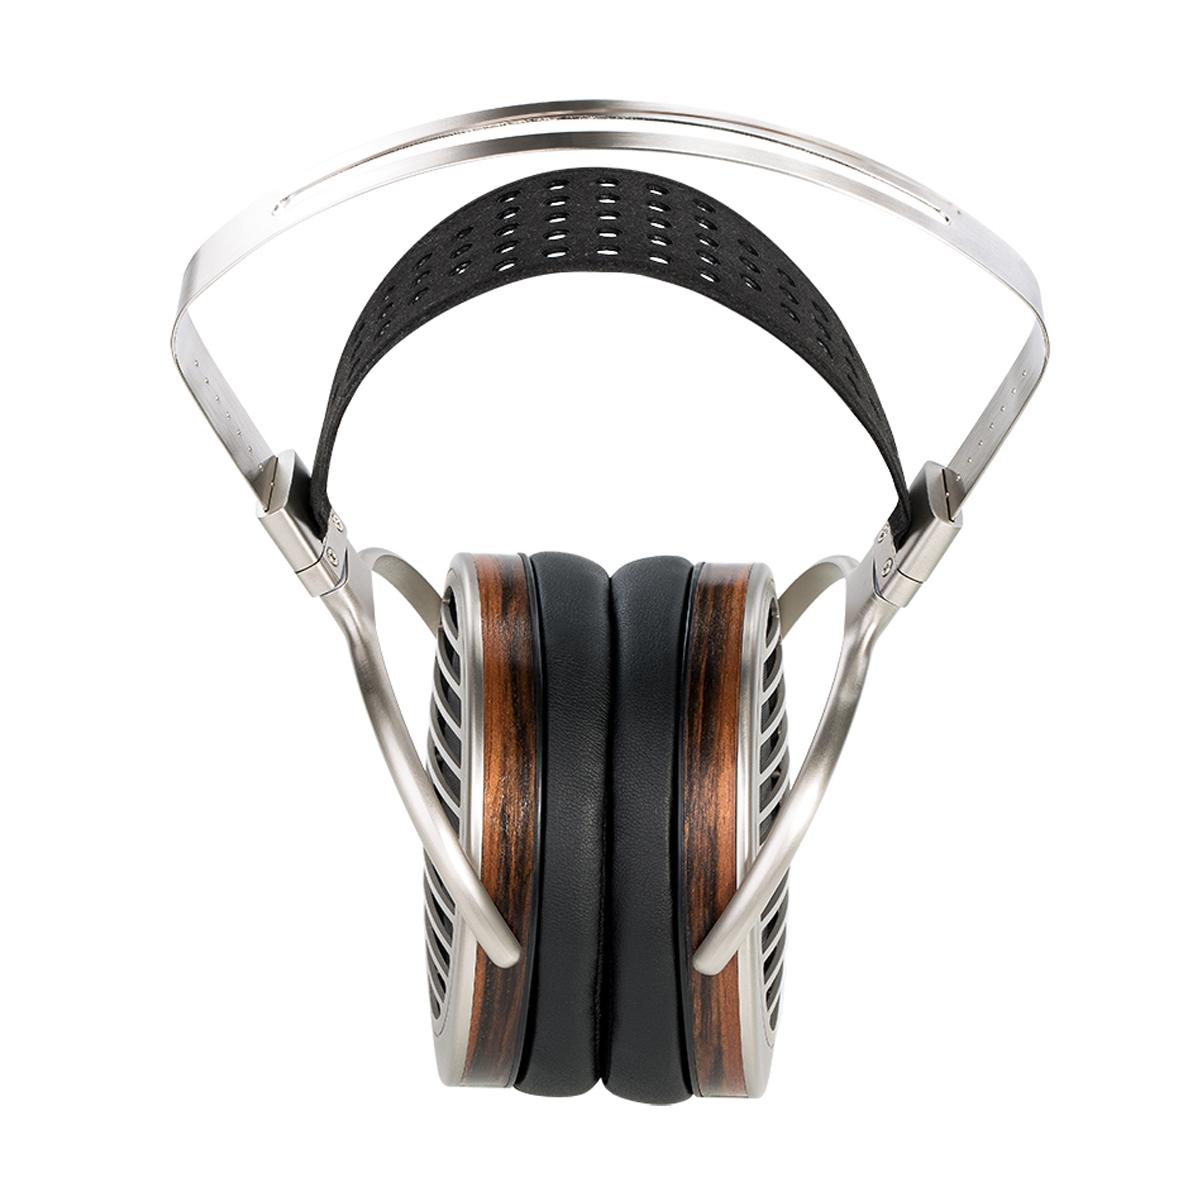 SUSVARA headphone price